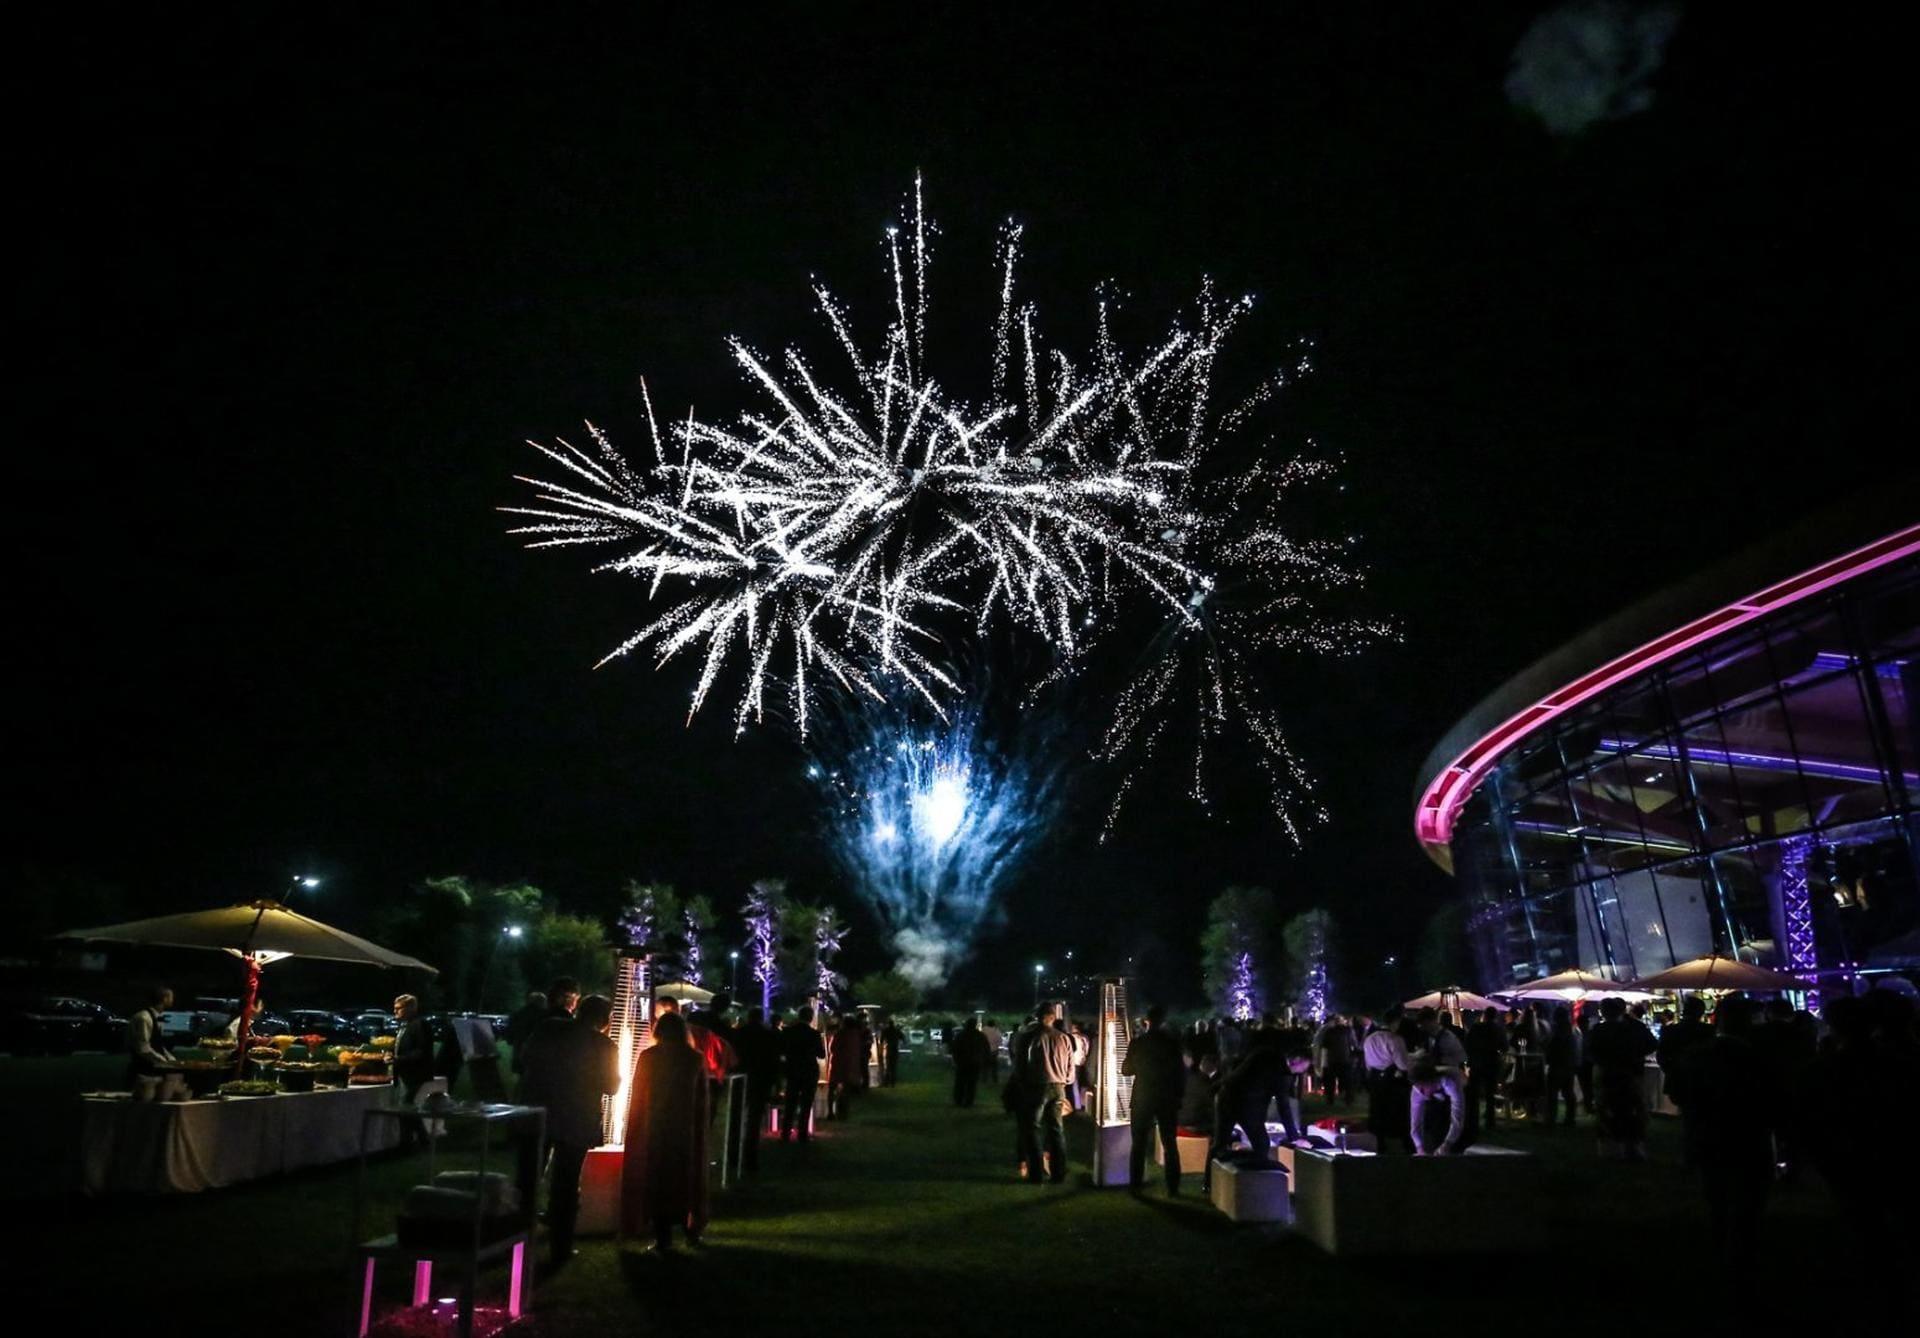 27.09.2018 - BAGNARA